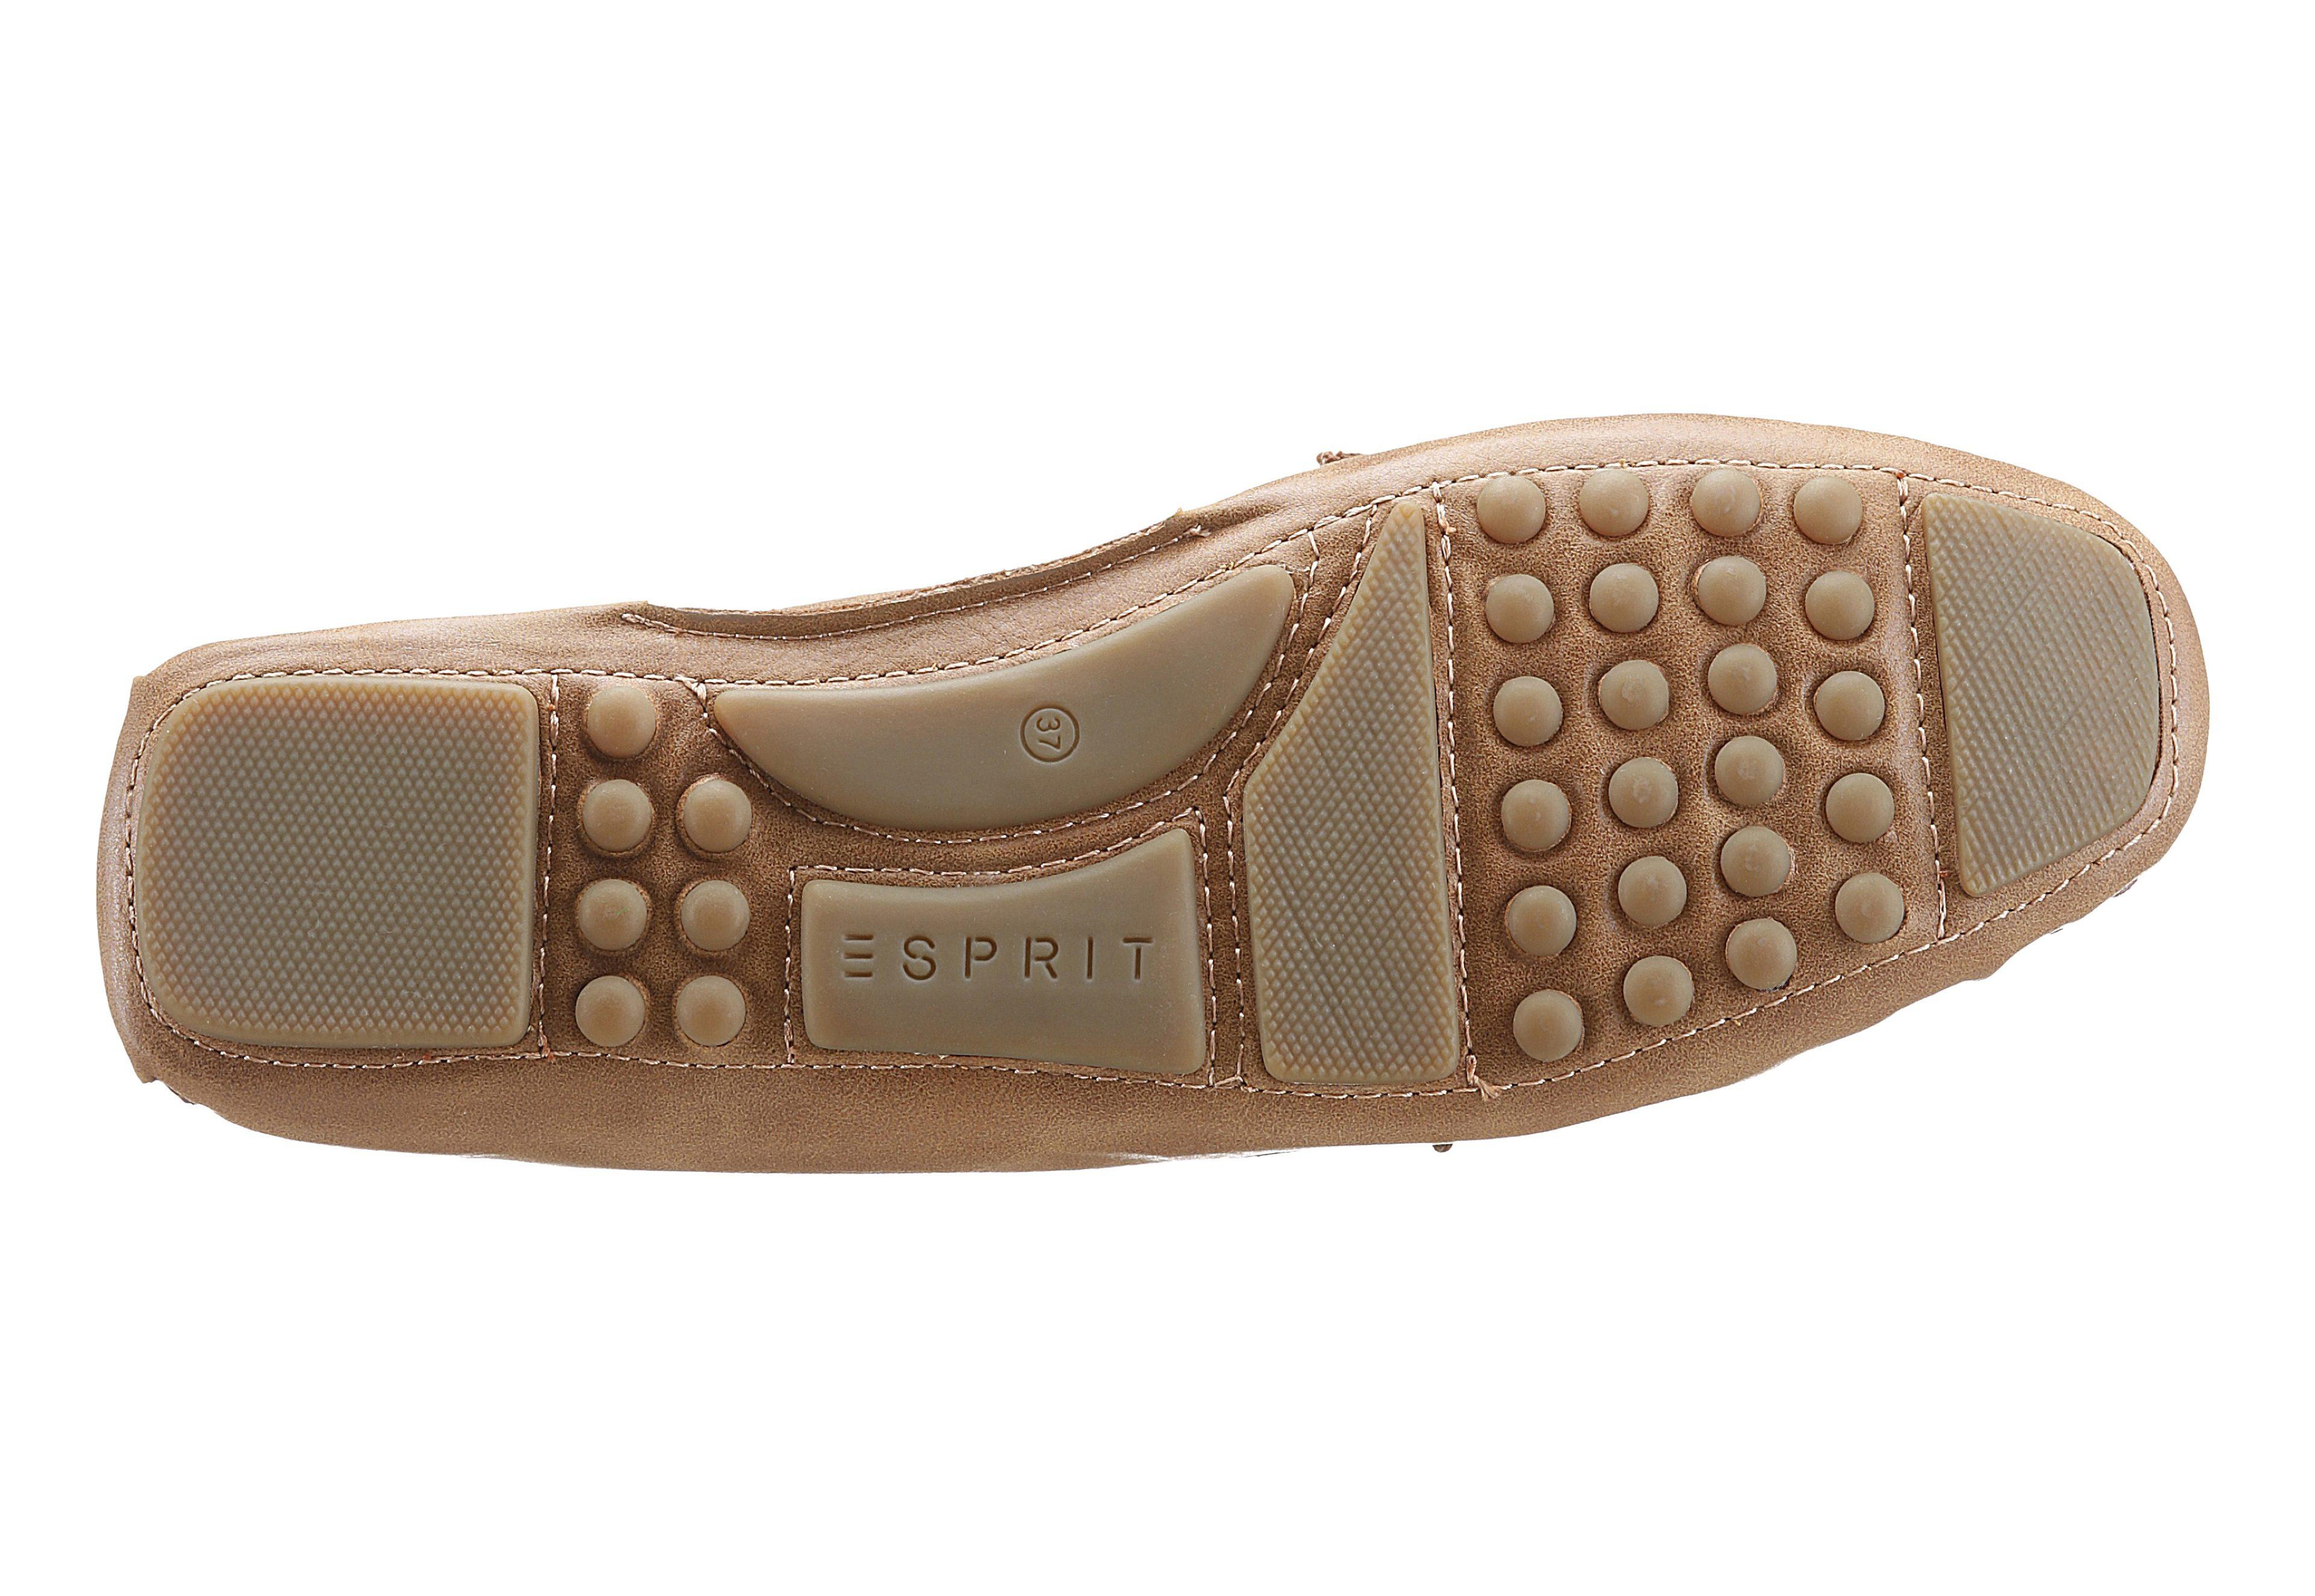 Esprit Sheena Loafer Slipper, in Mokassin-Optik  braun